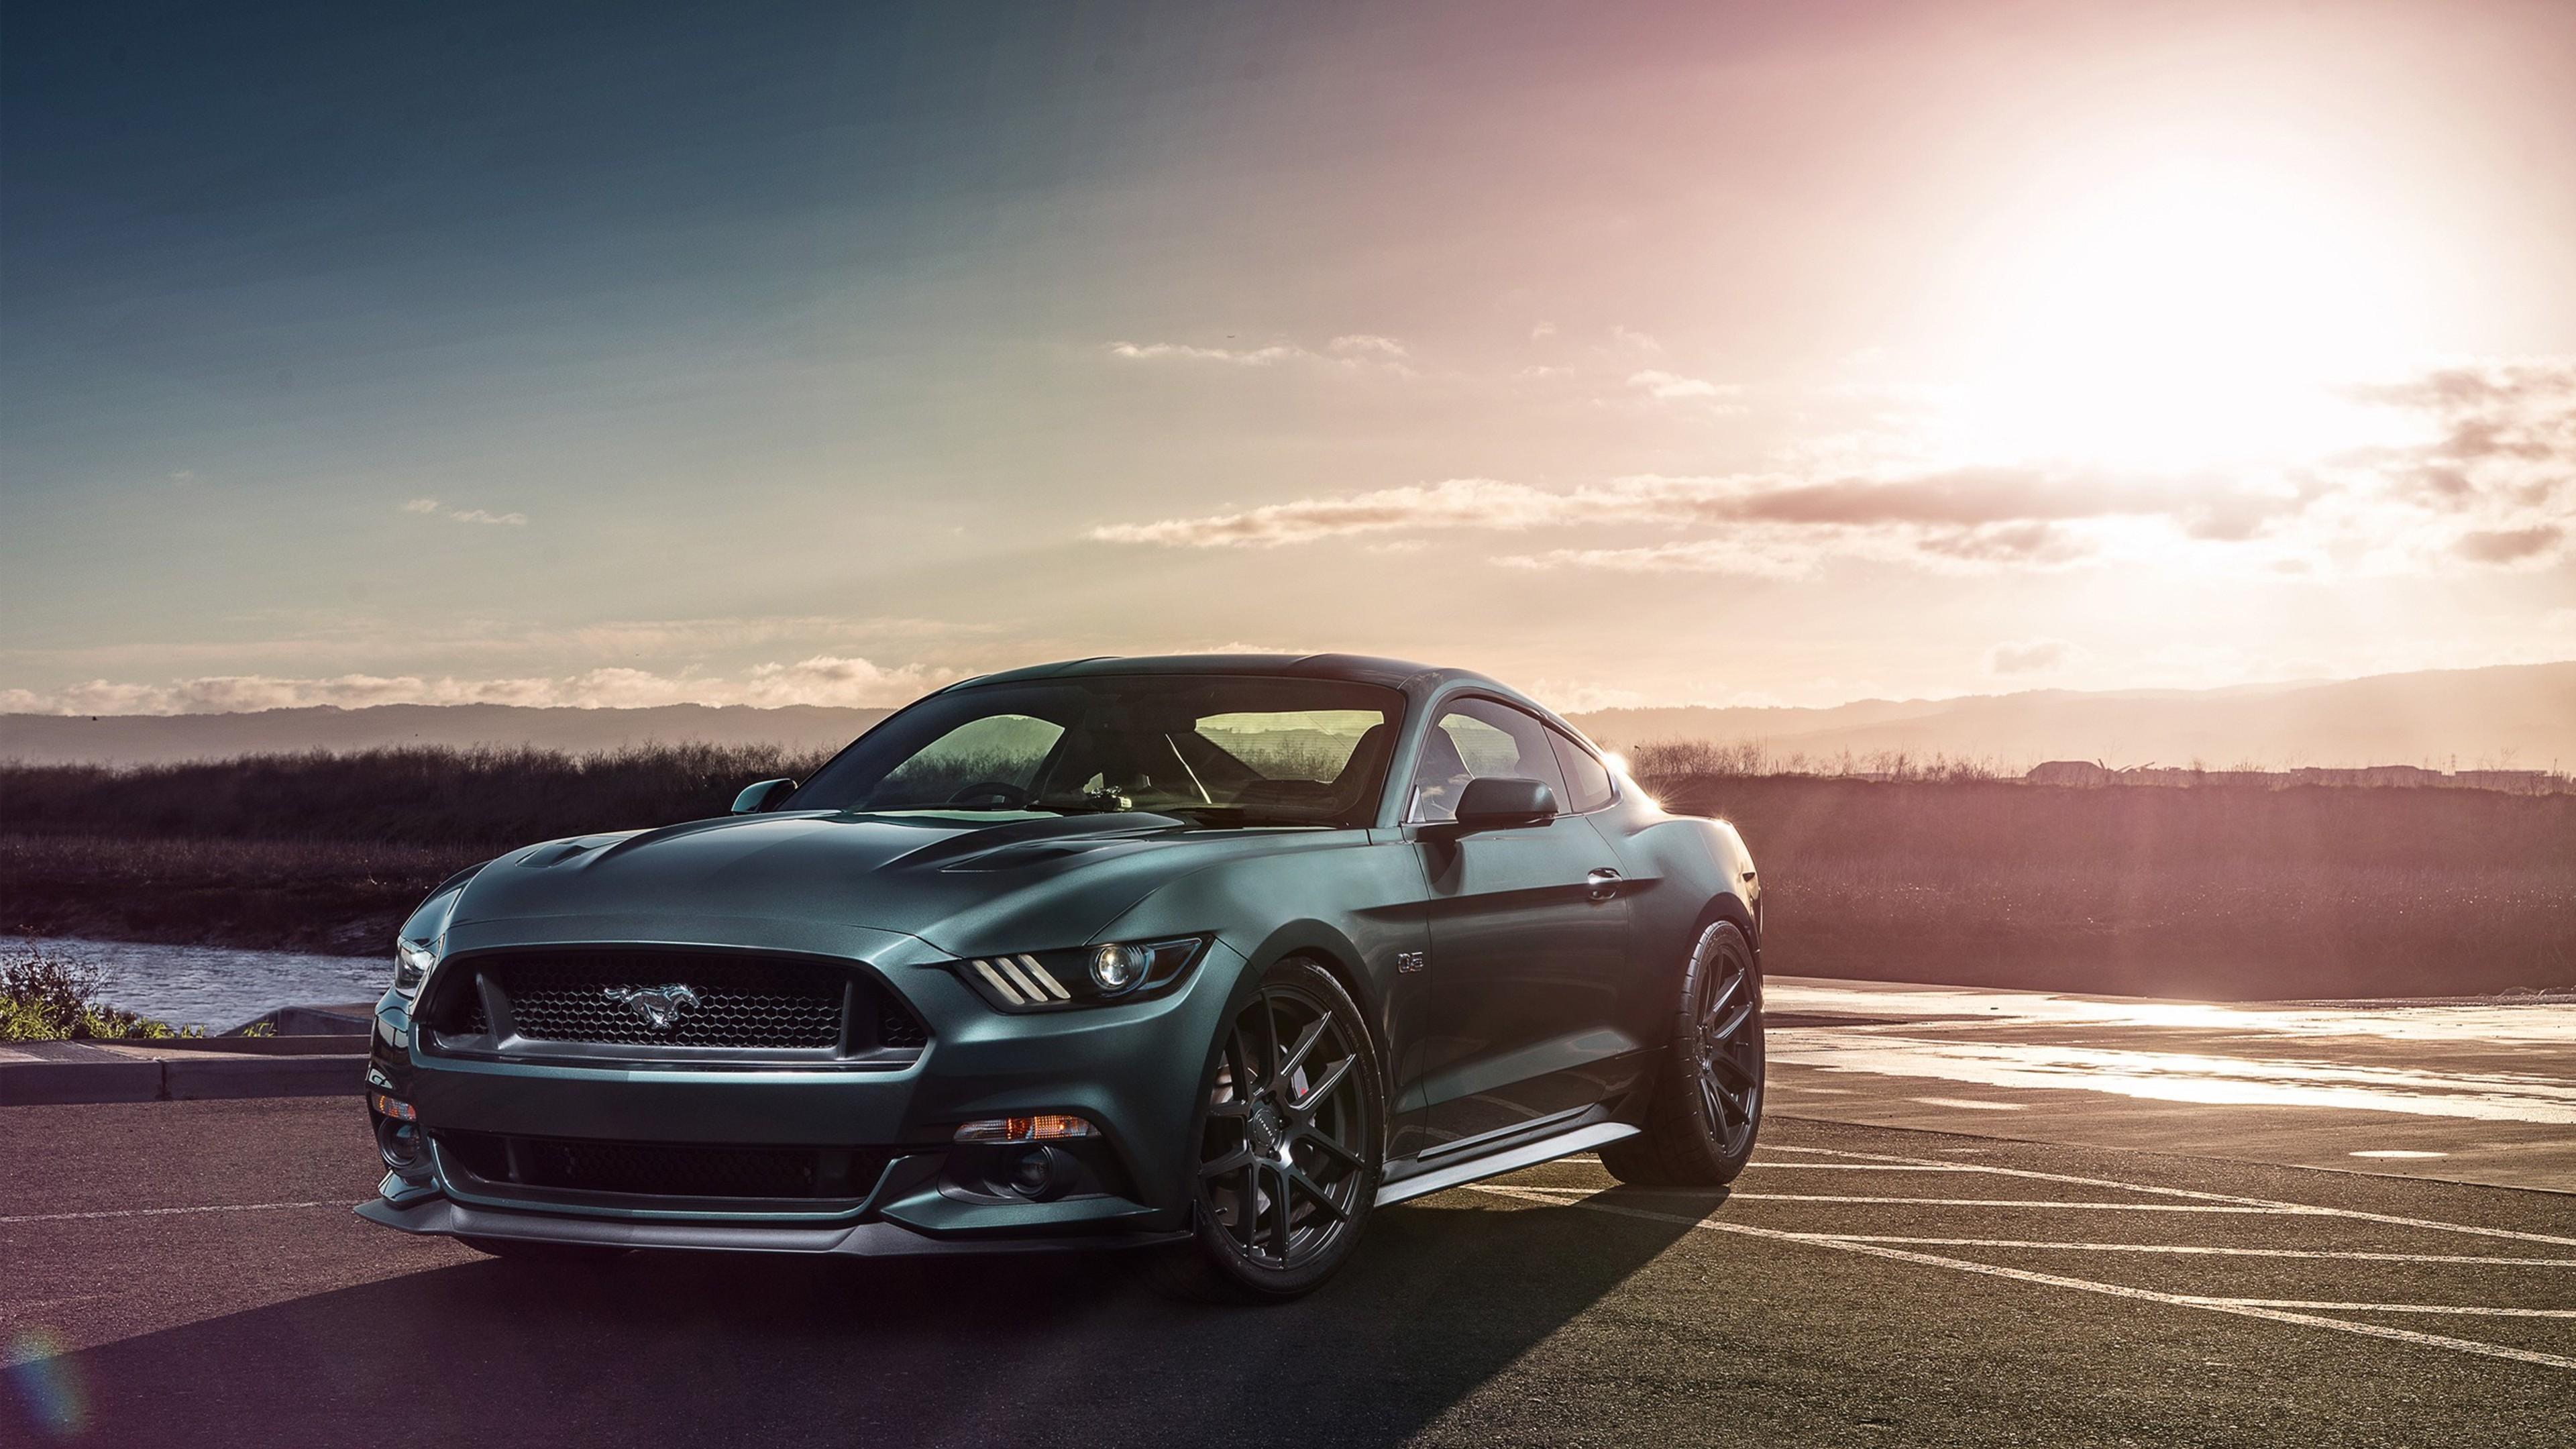 Ford Mustang Gt Velgen Wheels Hd Cars 4k Wallpapers